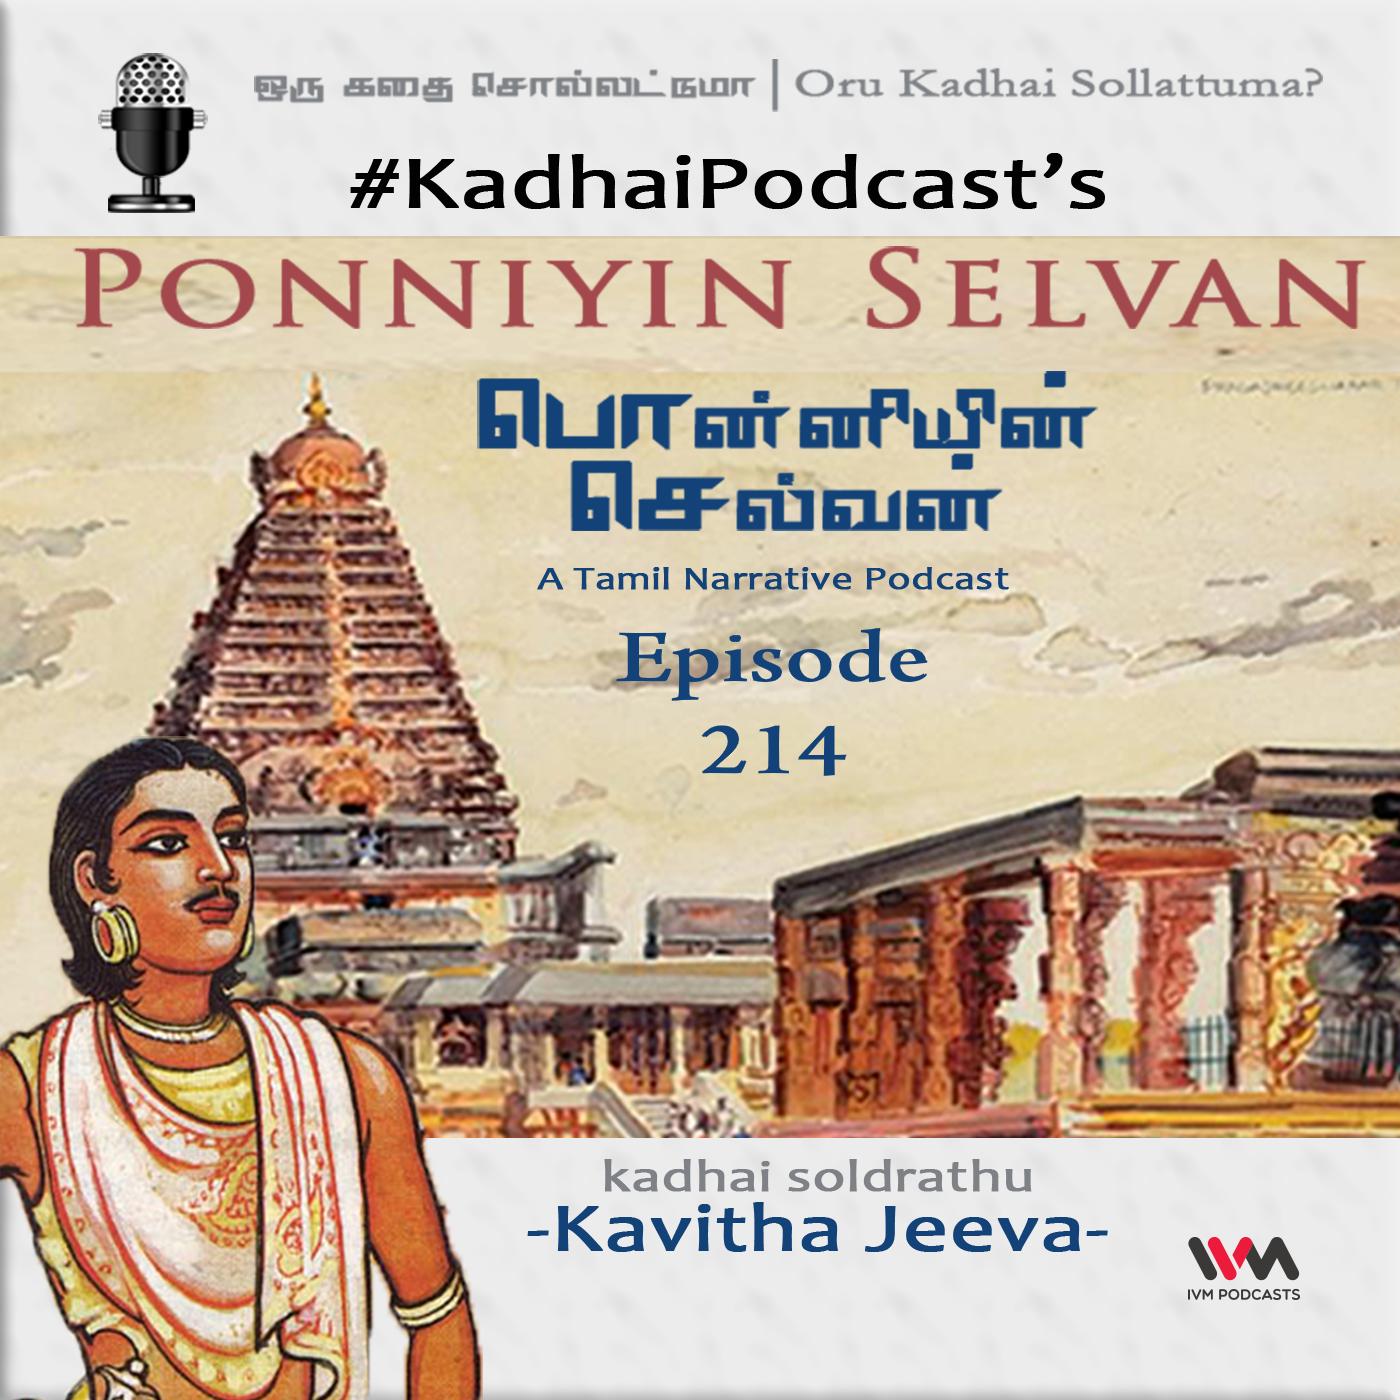 KadhaiPodcast's Ponniyin Selvan - Episode # 214